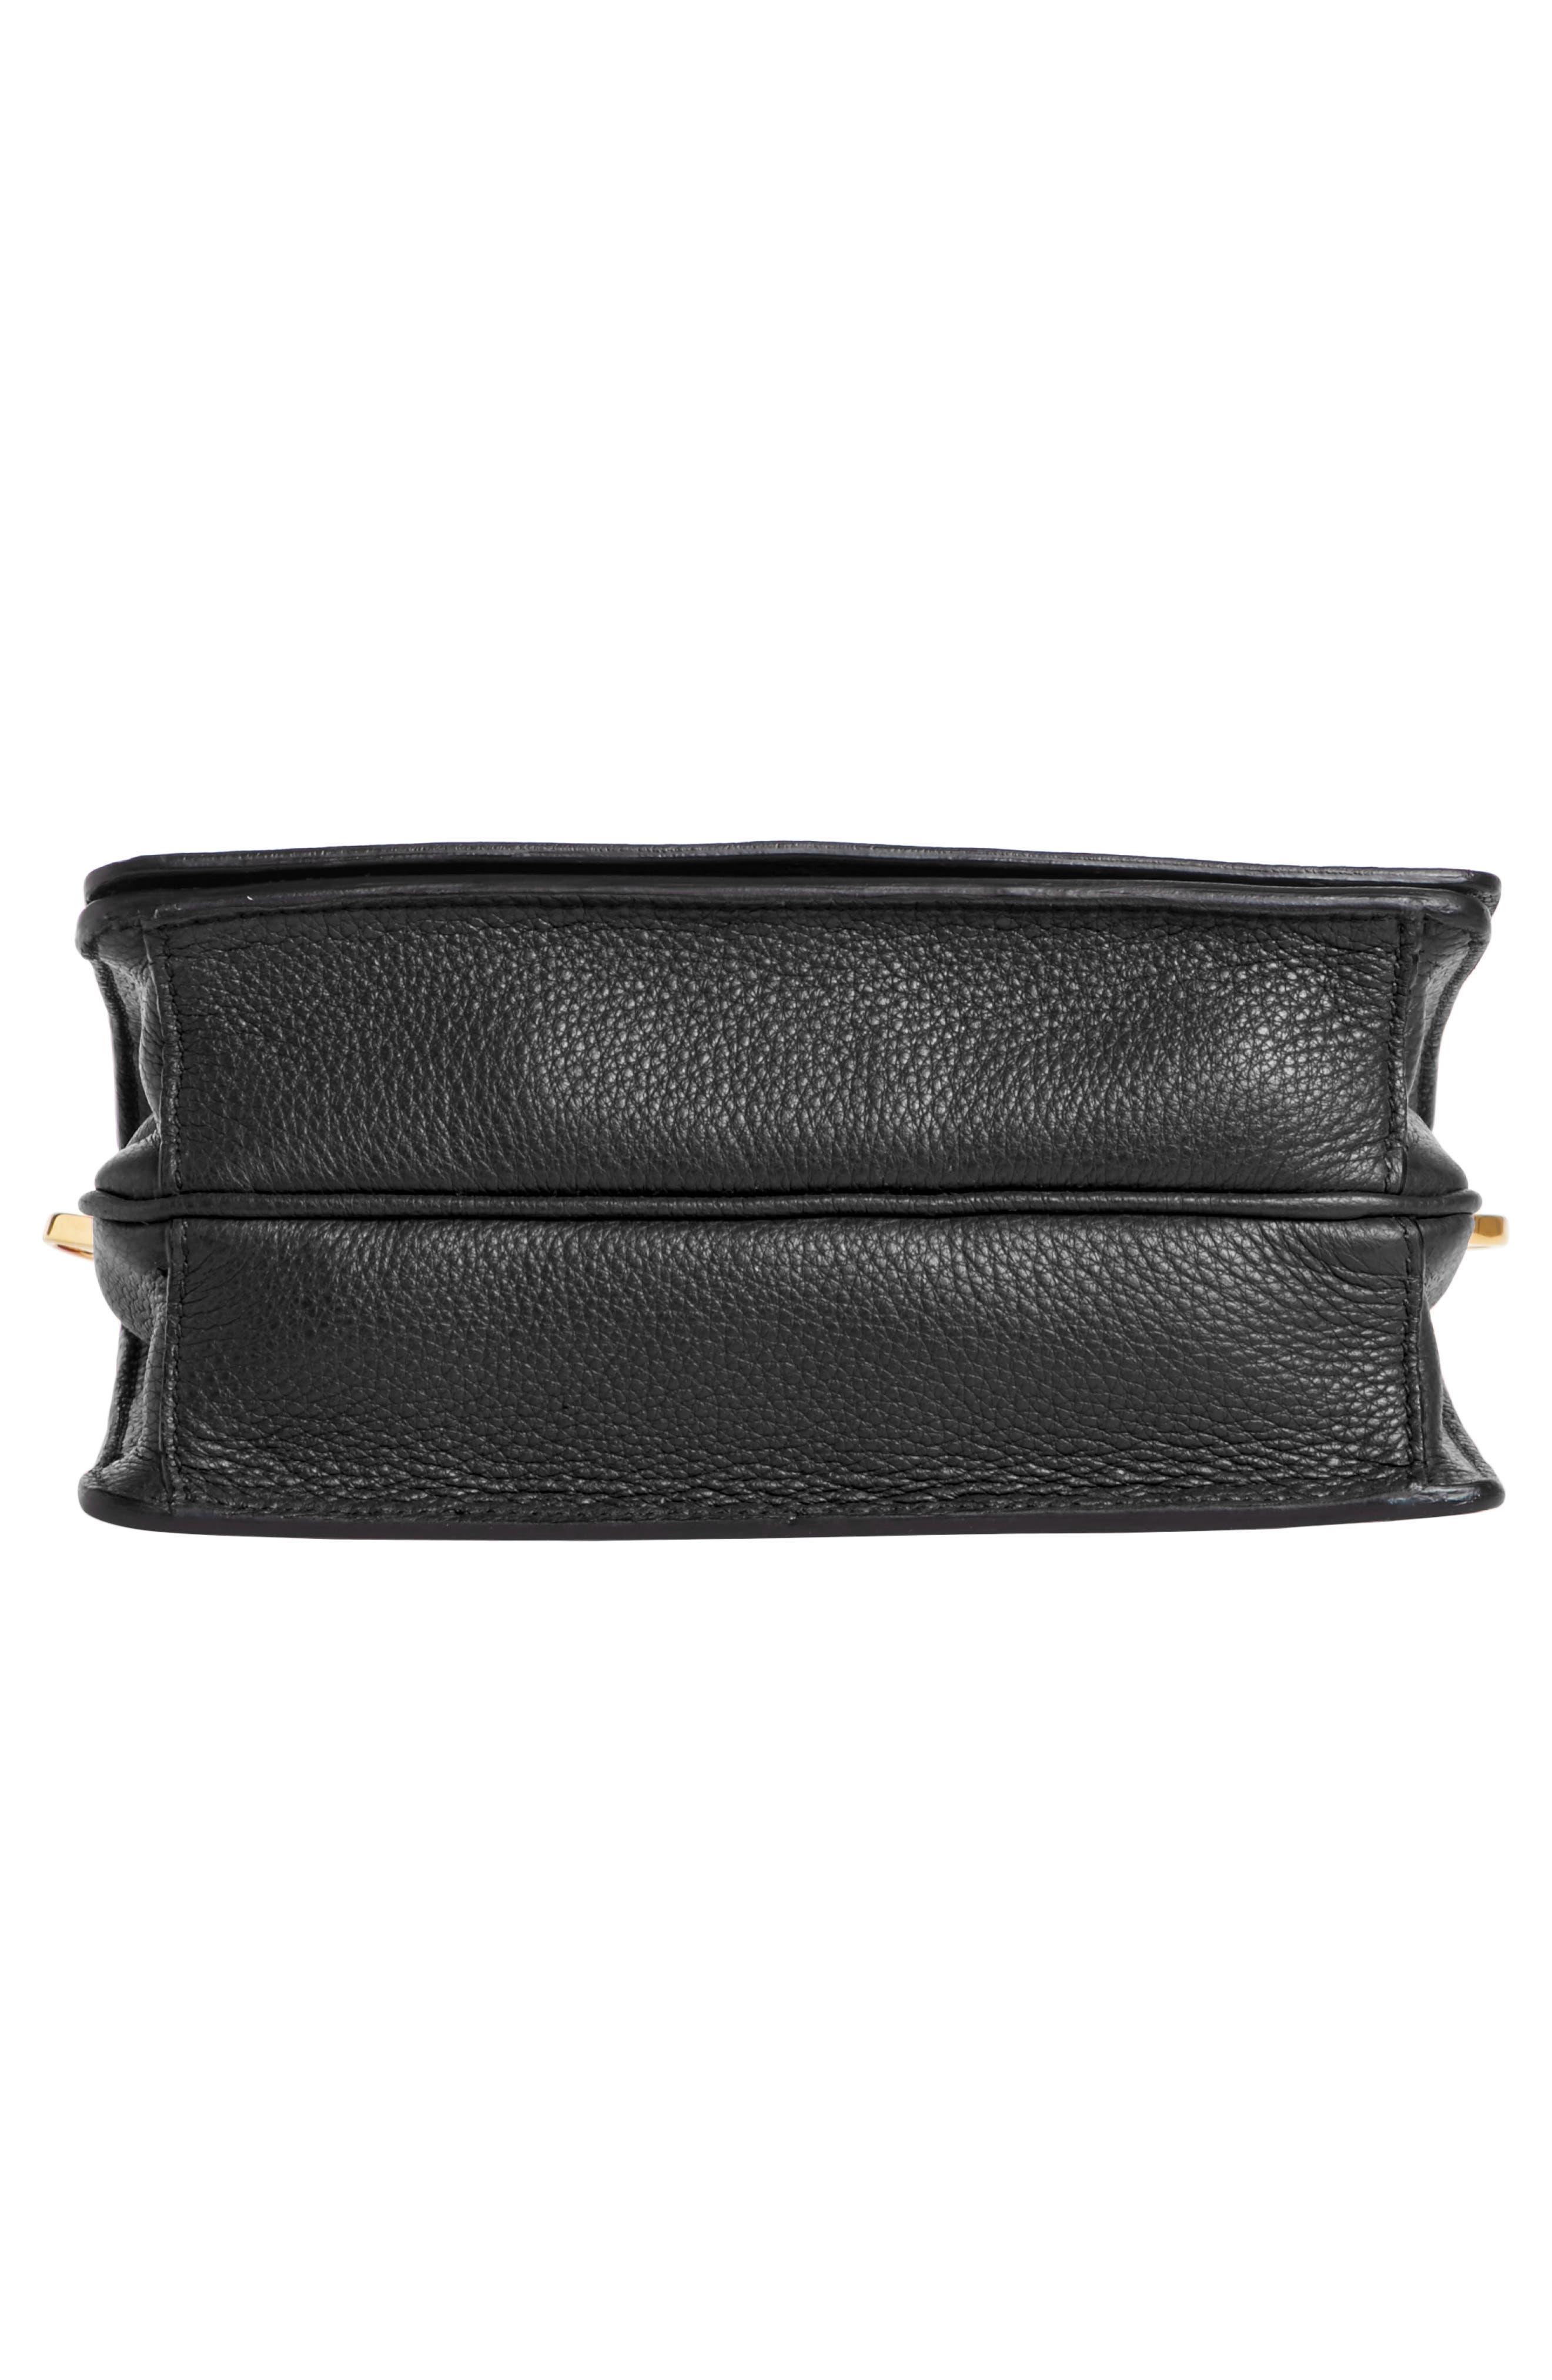 Vitello Daino Double Compartment Leather Shoulder Bag,                             Alternate thumbnail 6, color,                             001